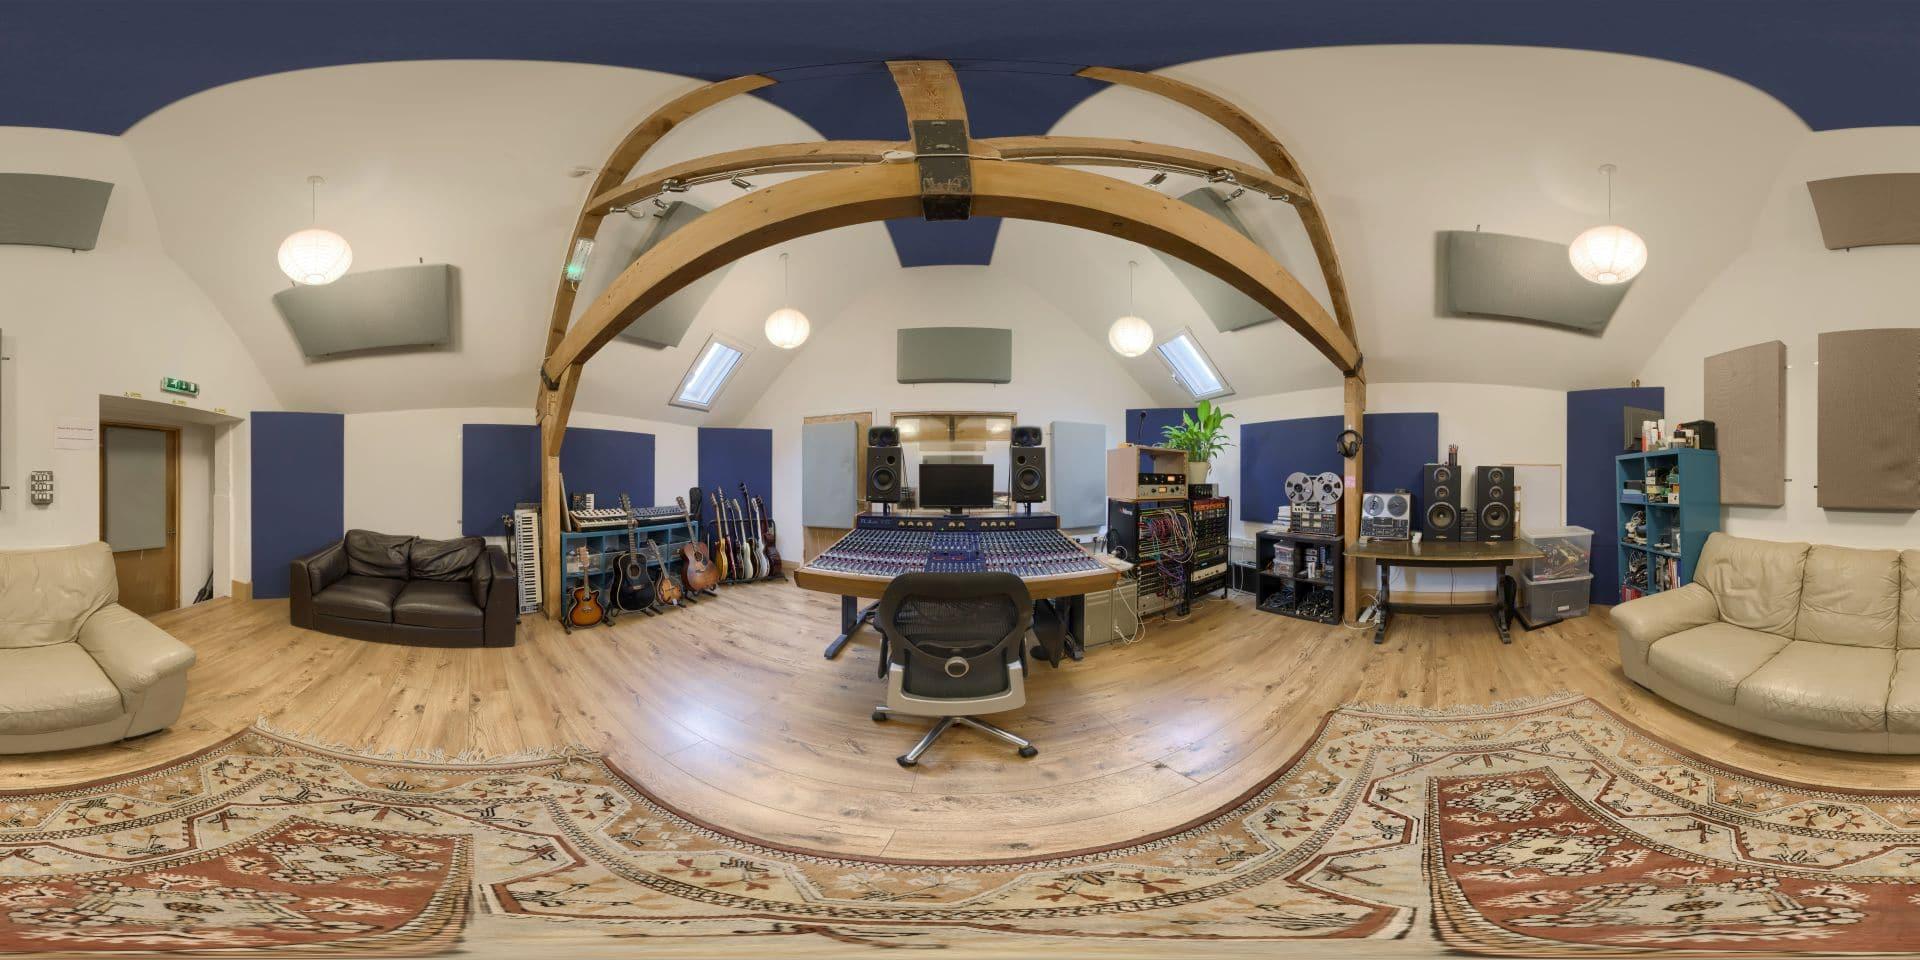 Brighton Road Recording Studios – 360 Virtual Tour